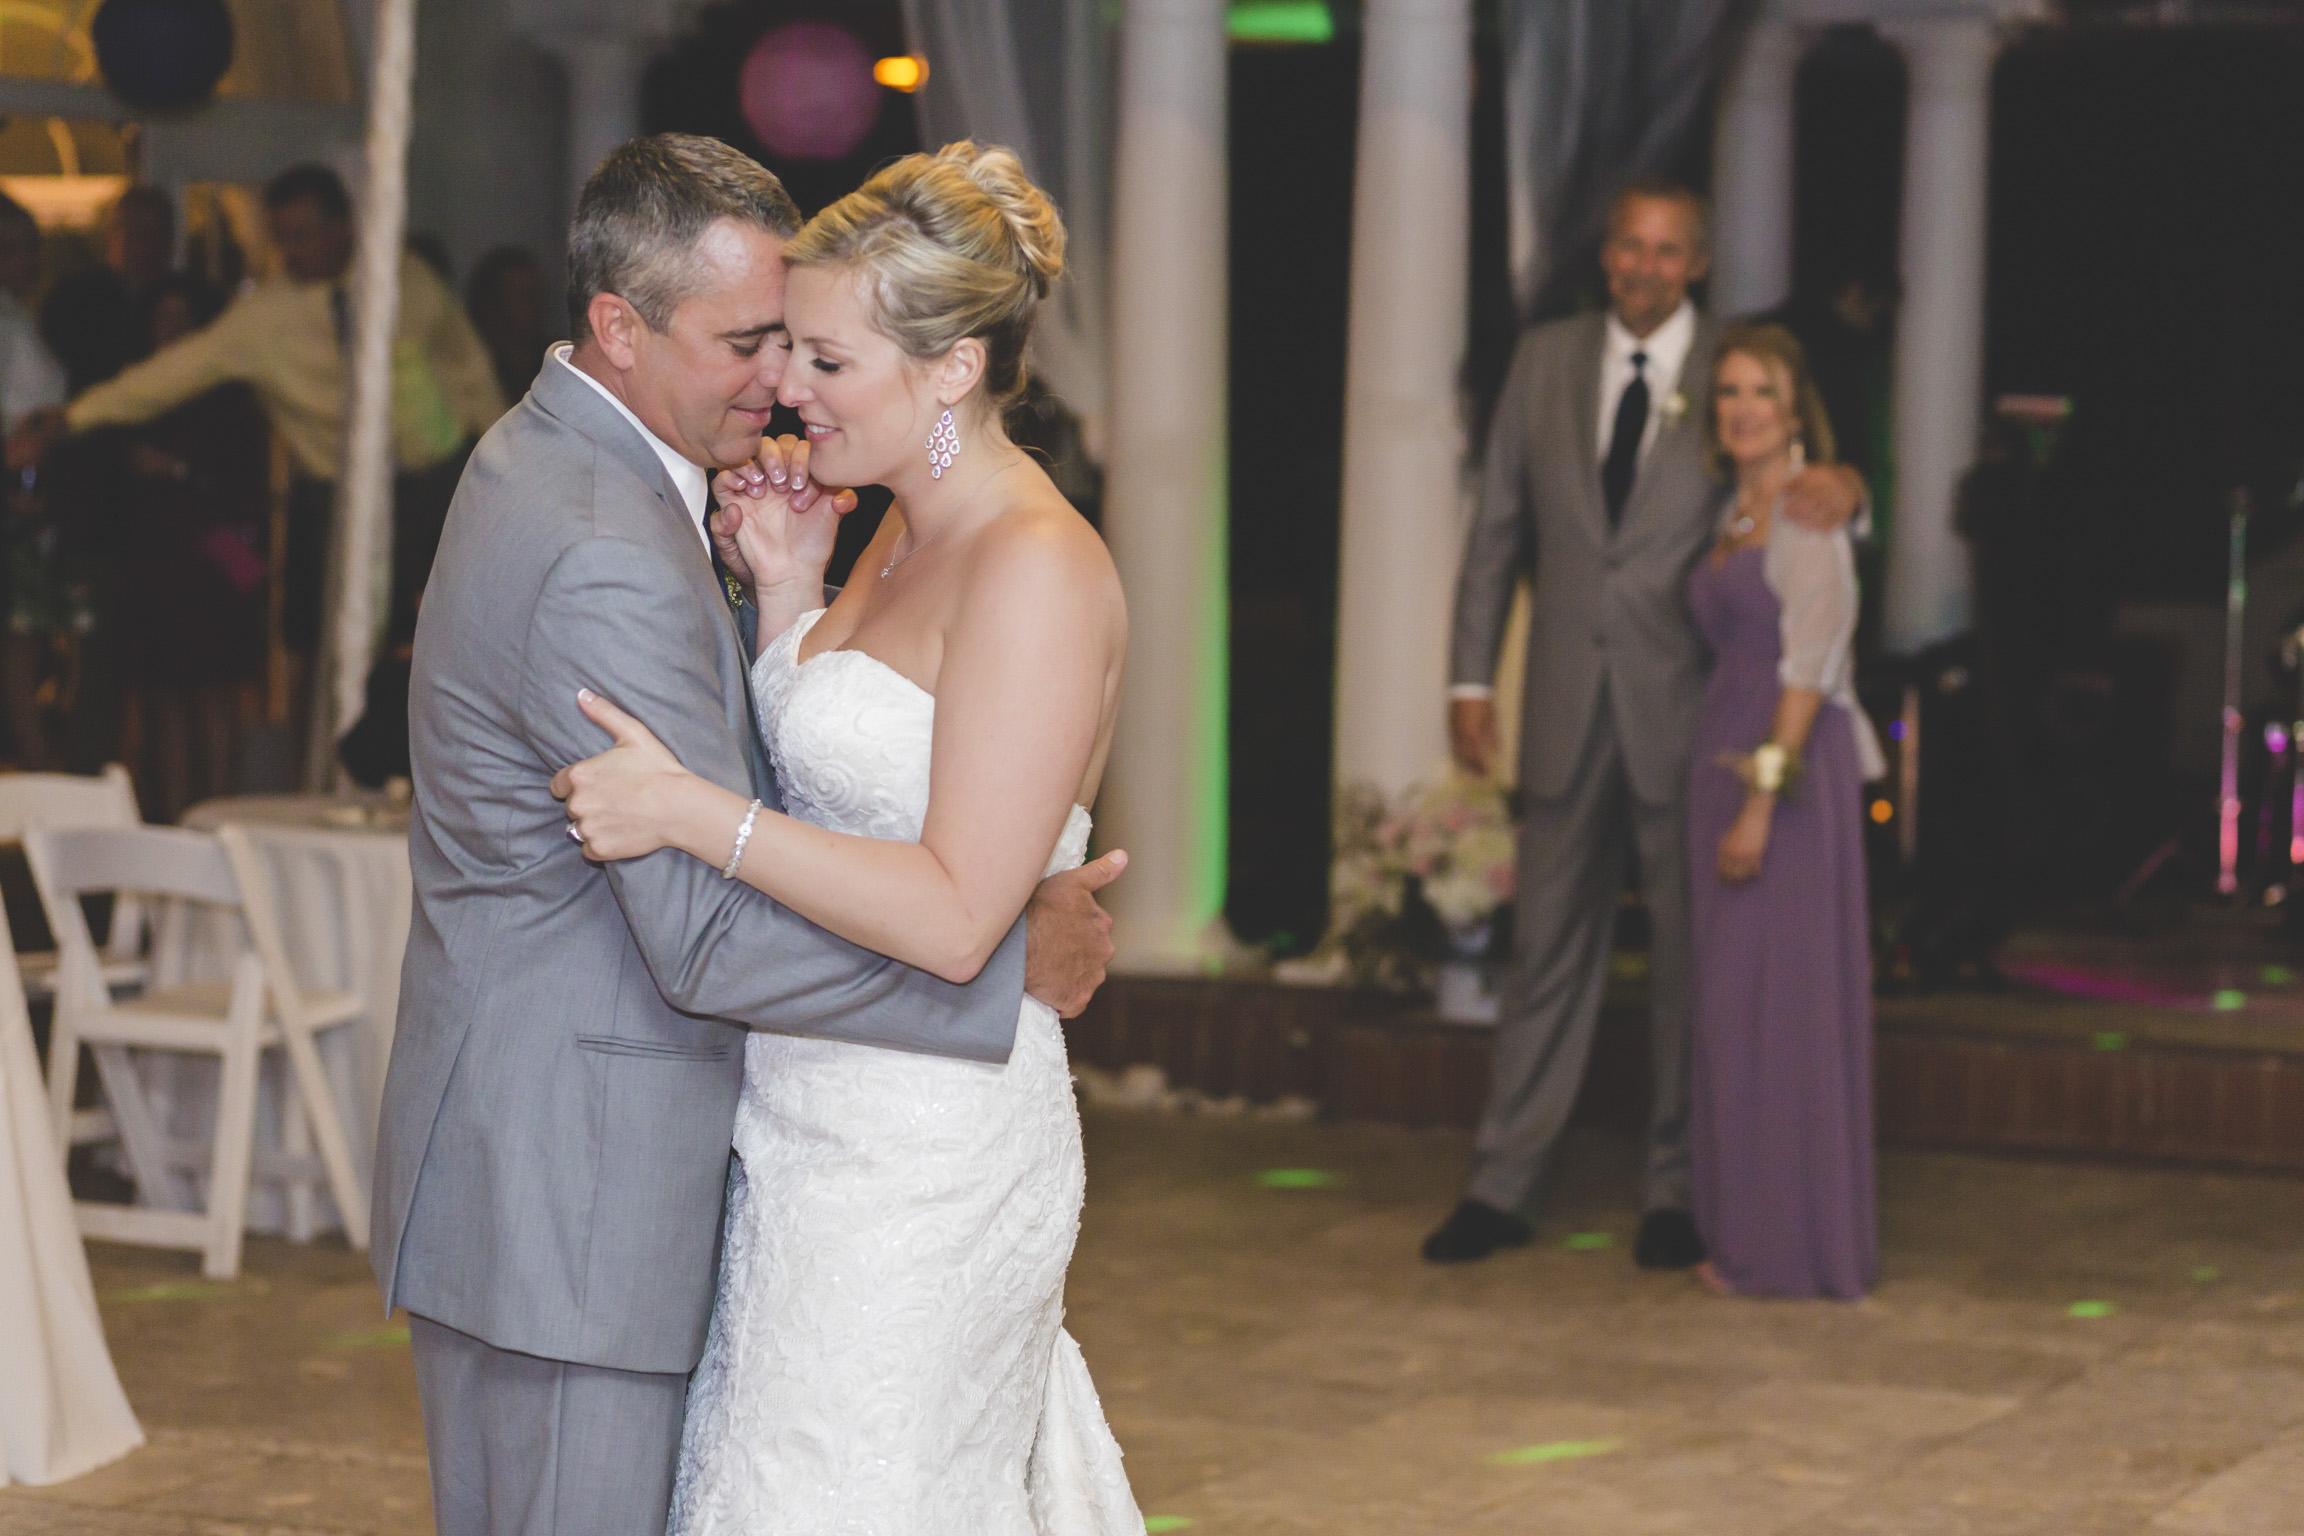 adam-szarmack-casa-marina-wedding-photographer-jacksonville-beach-florida-51.jpg